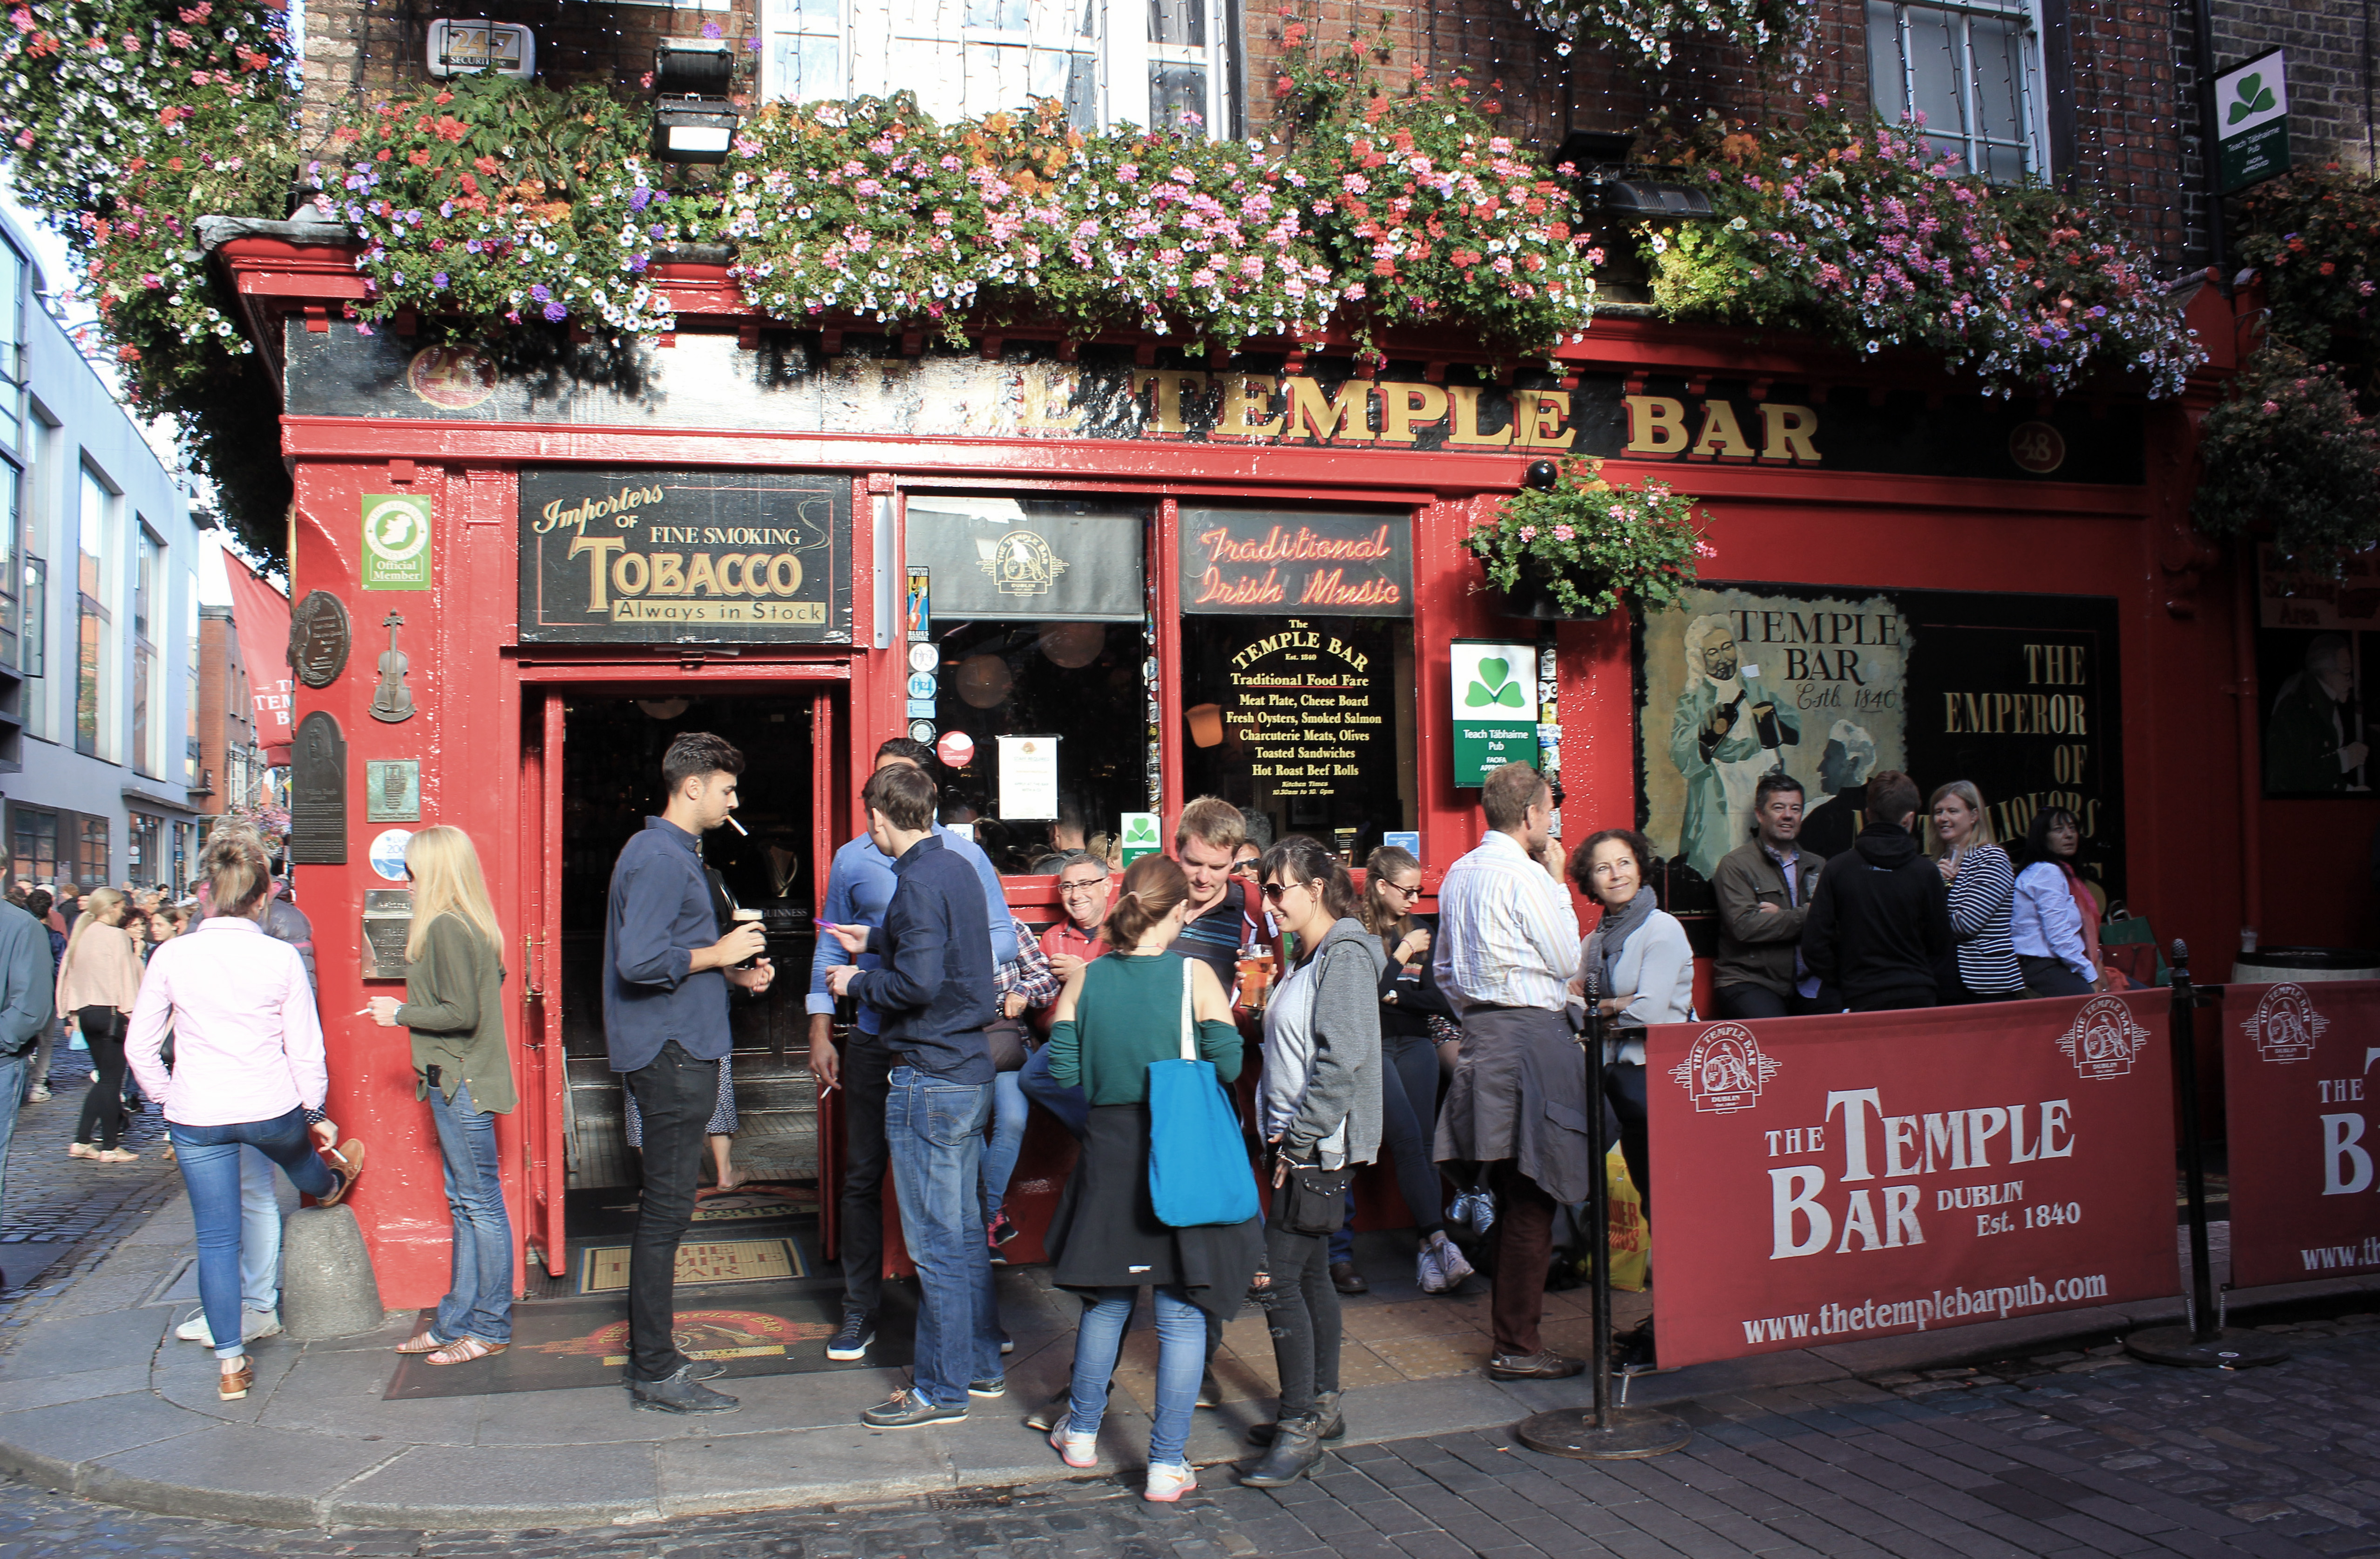 Voyages-et-compagnie.com - Blog voyage | Road trip en Irlande Dublin